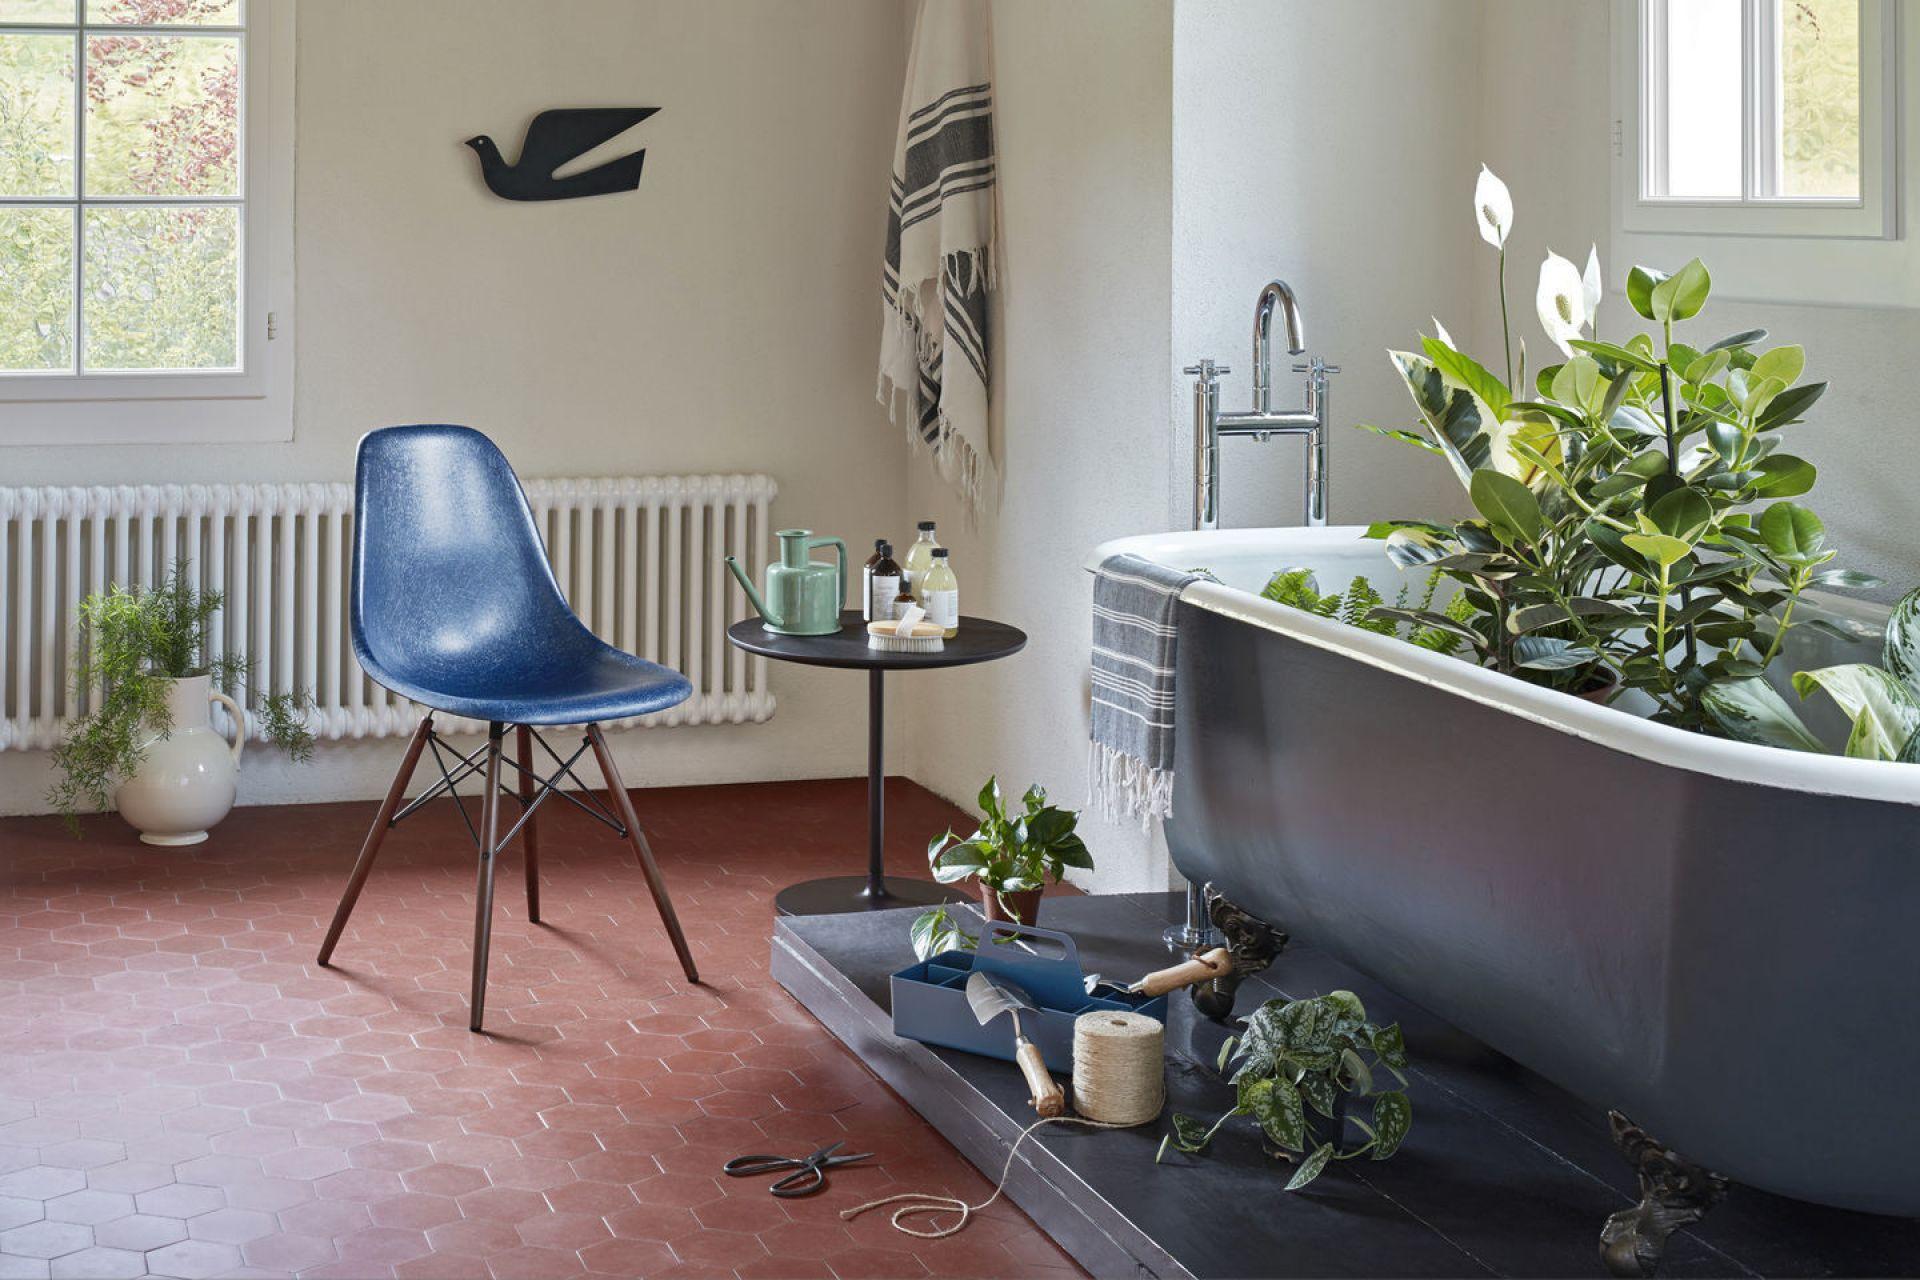 Eames Fiberglass Chair DSW Stuhl Vitra